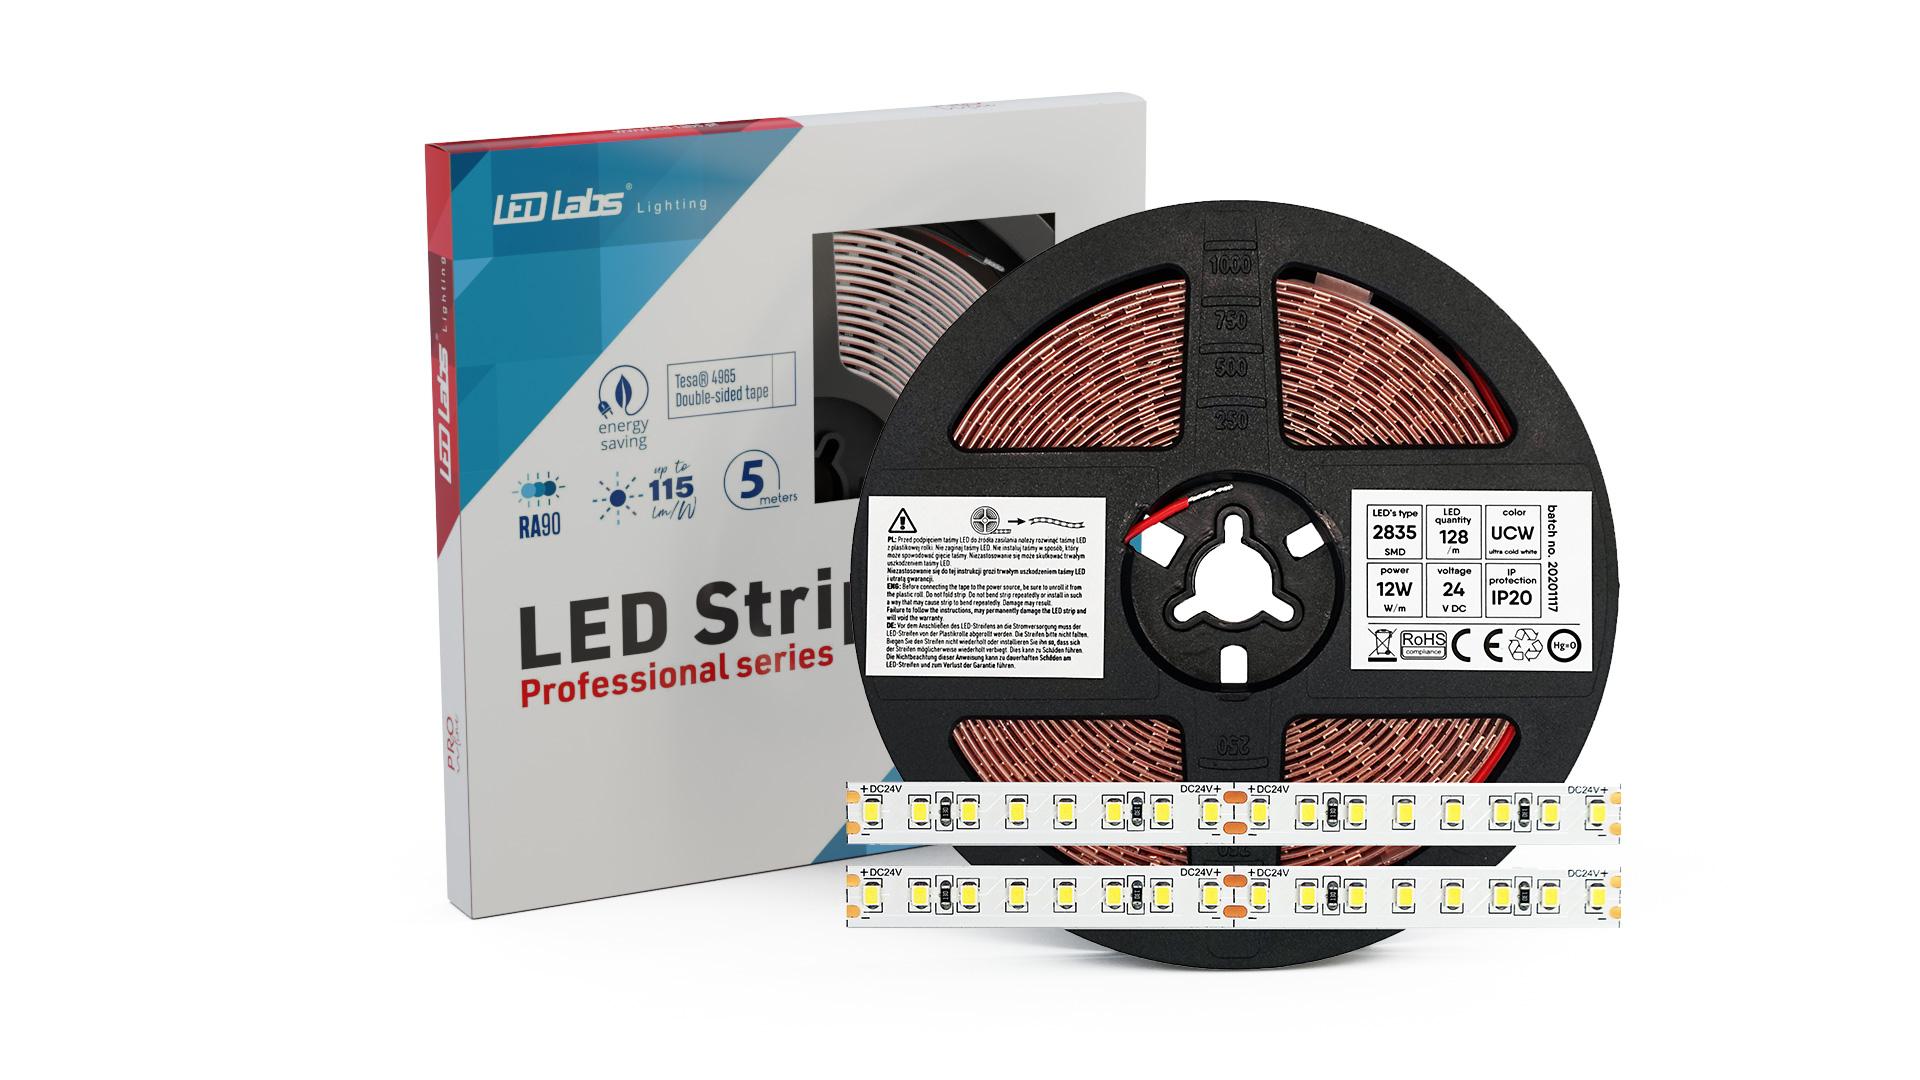 LED Strip PRO 5Y 24V 640 LED 2835 SMD 12W 10000K RA90